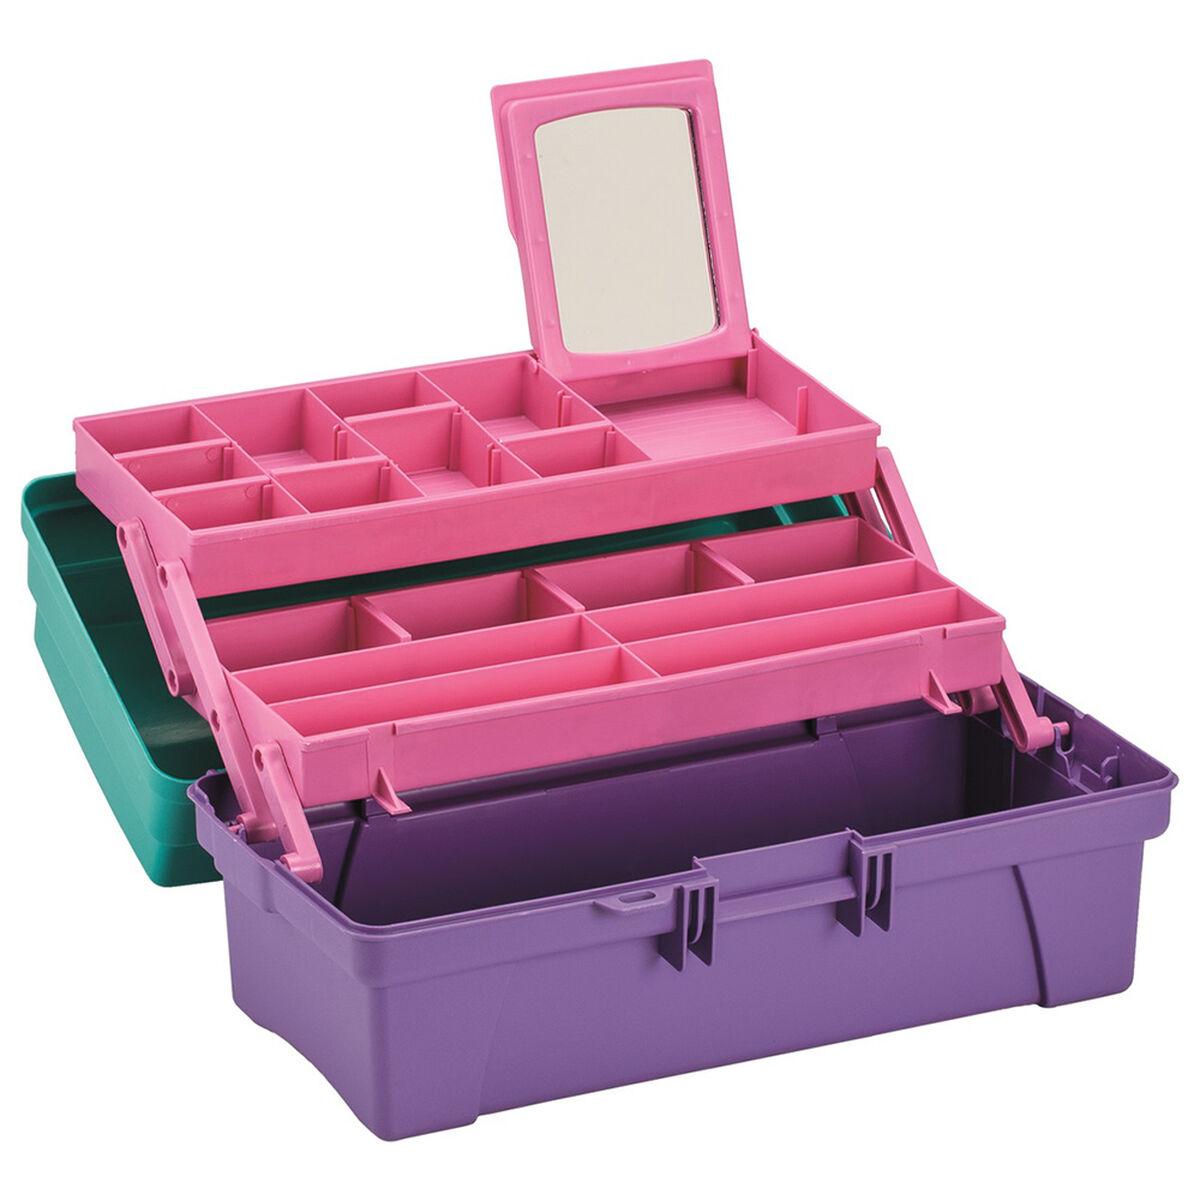 Caja Organizadora Plástica Rimax Rx3436 Verde/Lila